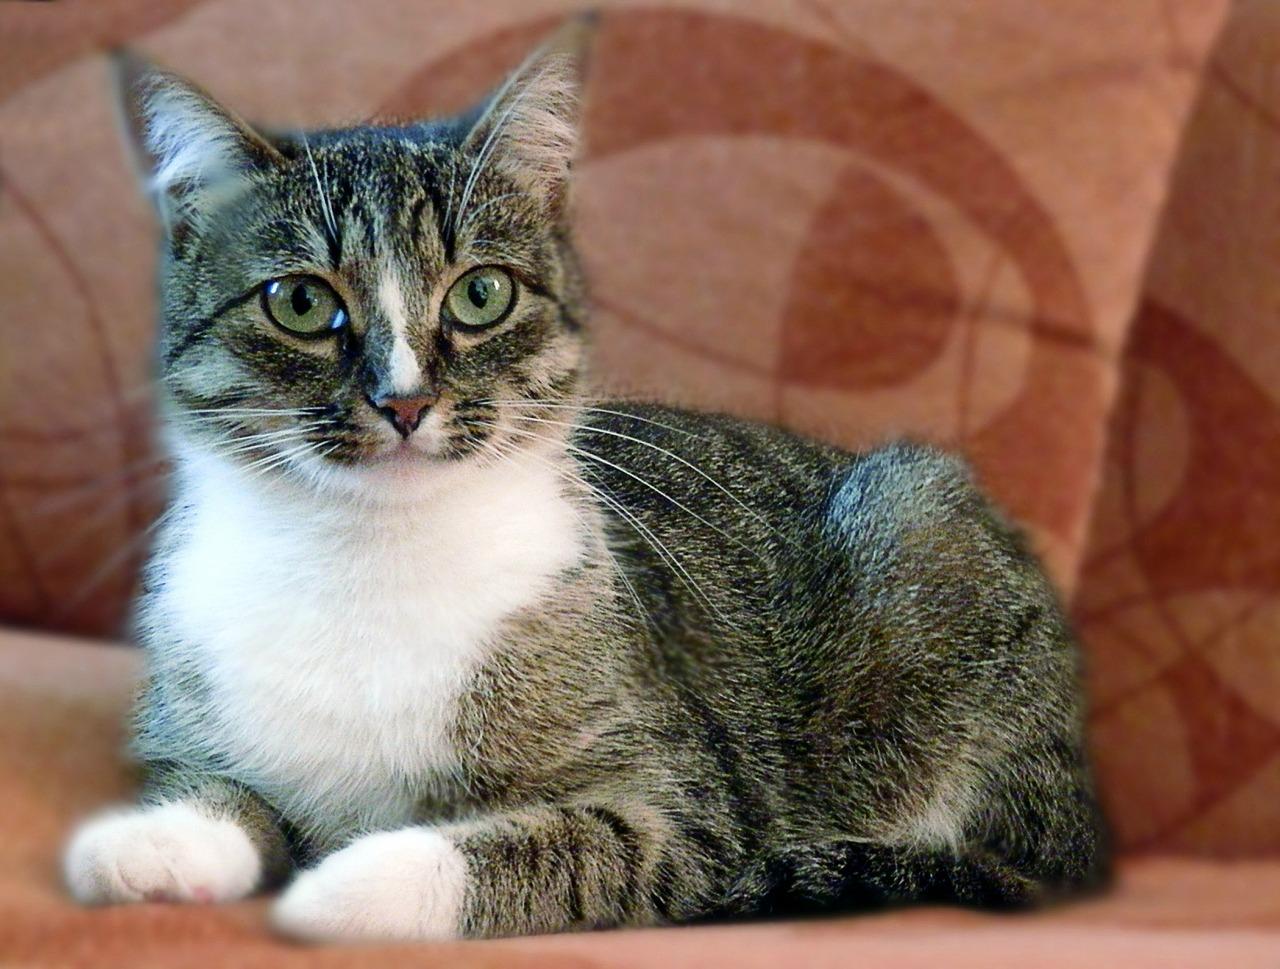 Картинка домашнего животного кошка